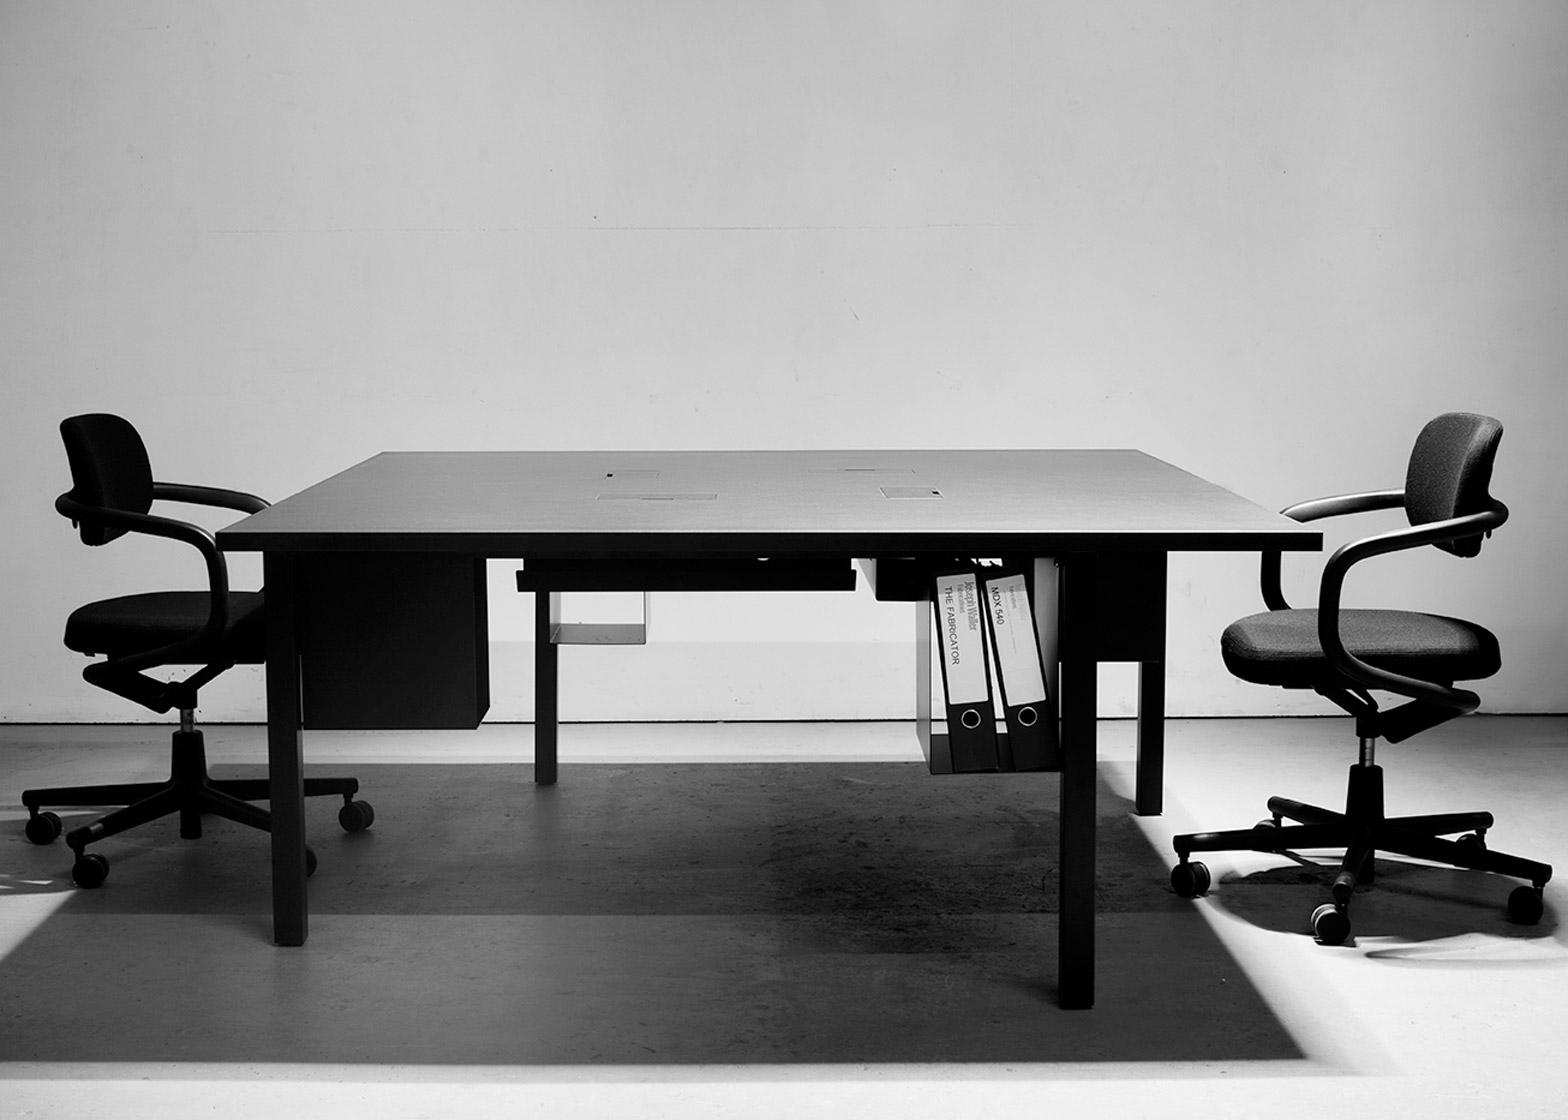 Bespoke Silhouette desks designed by Pernilla Ohrstedt for the Dezeen office